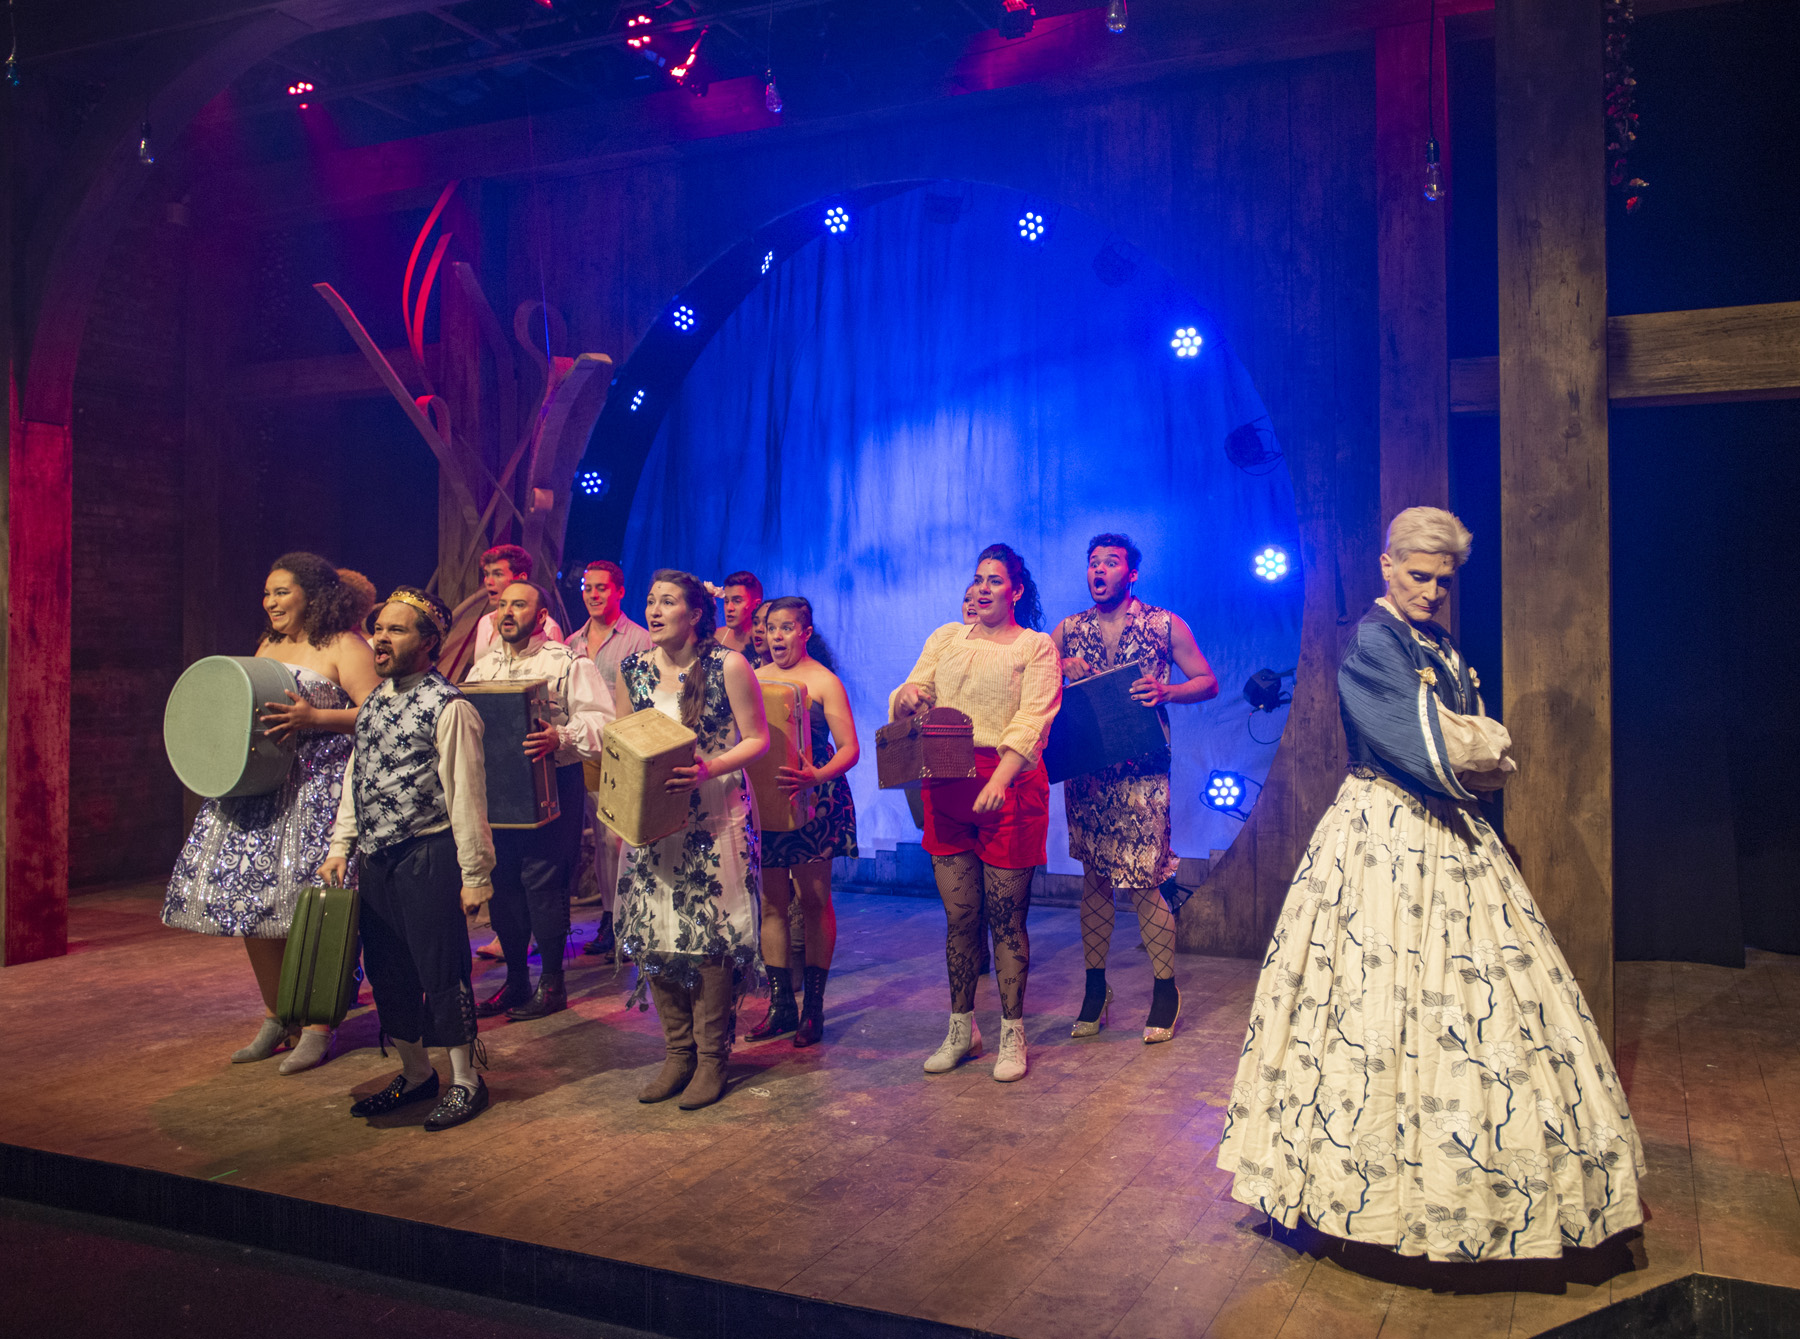 Queen Gynecia (Liz Norton) and the Ensemble of Head Over Heels